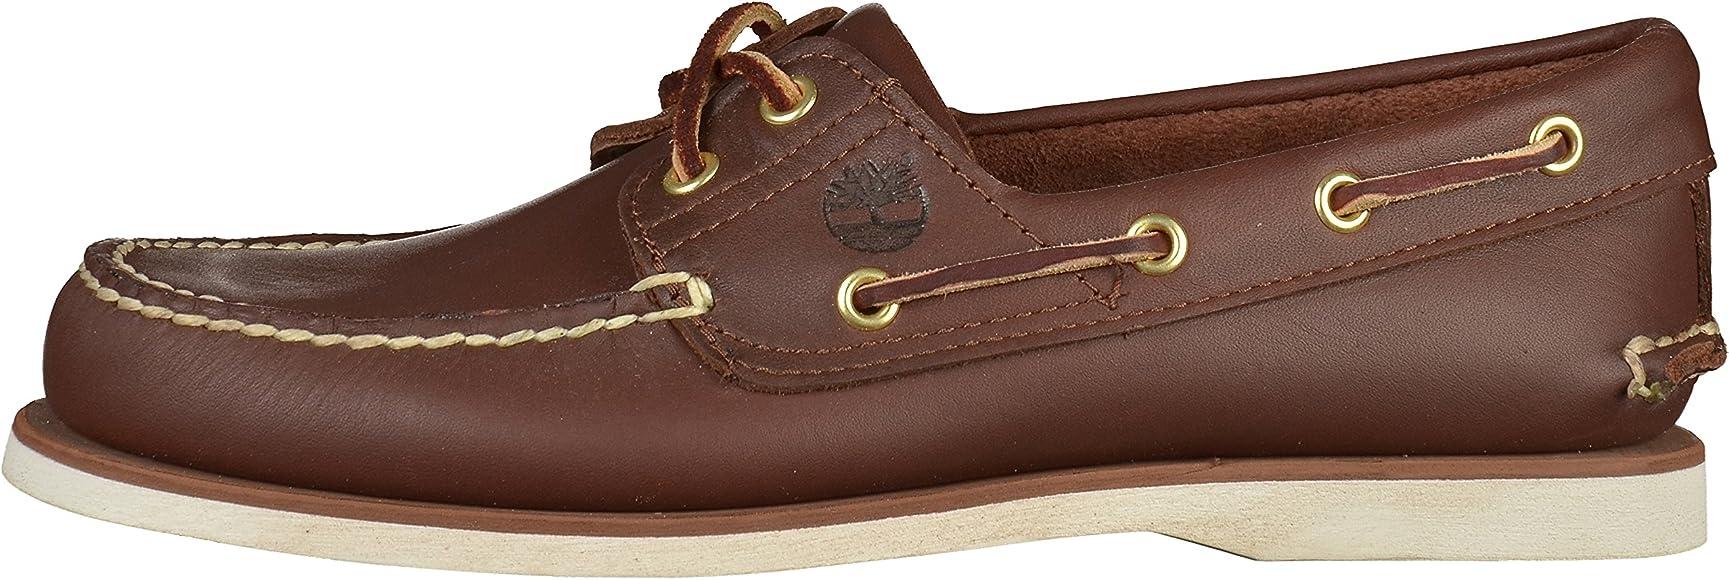 Classic 2-Eye Boat Shoe Boat shoe